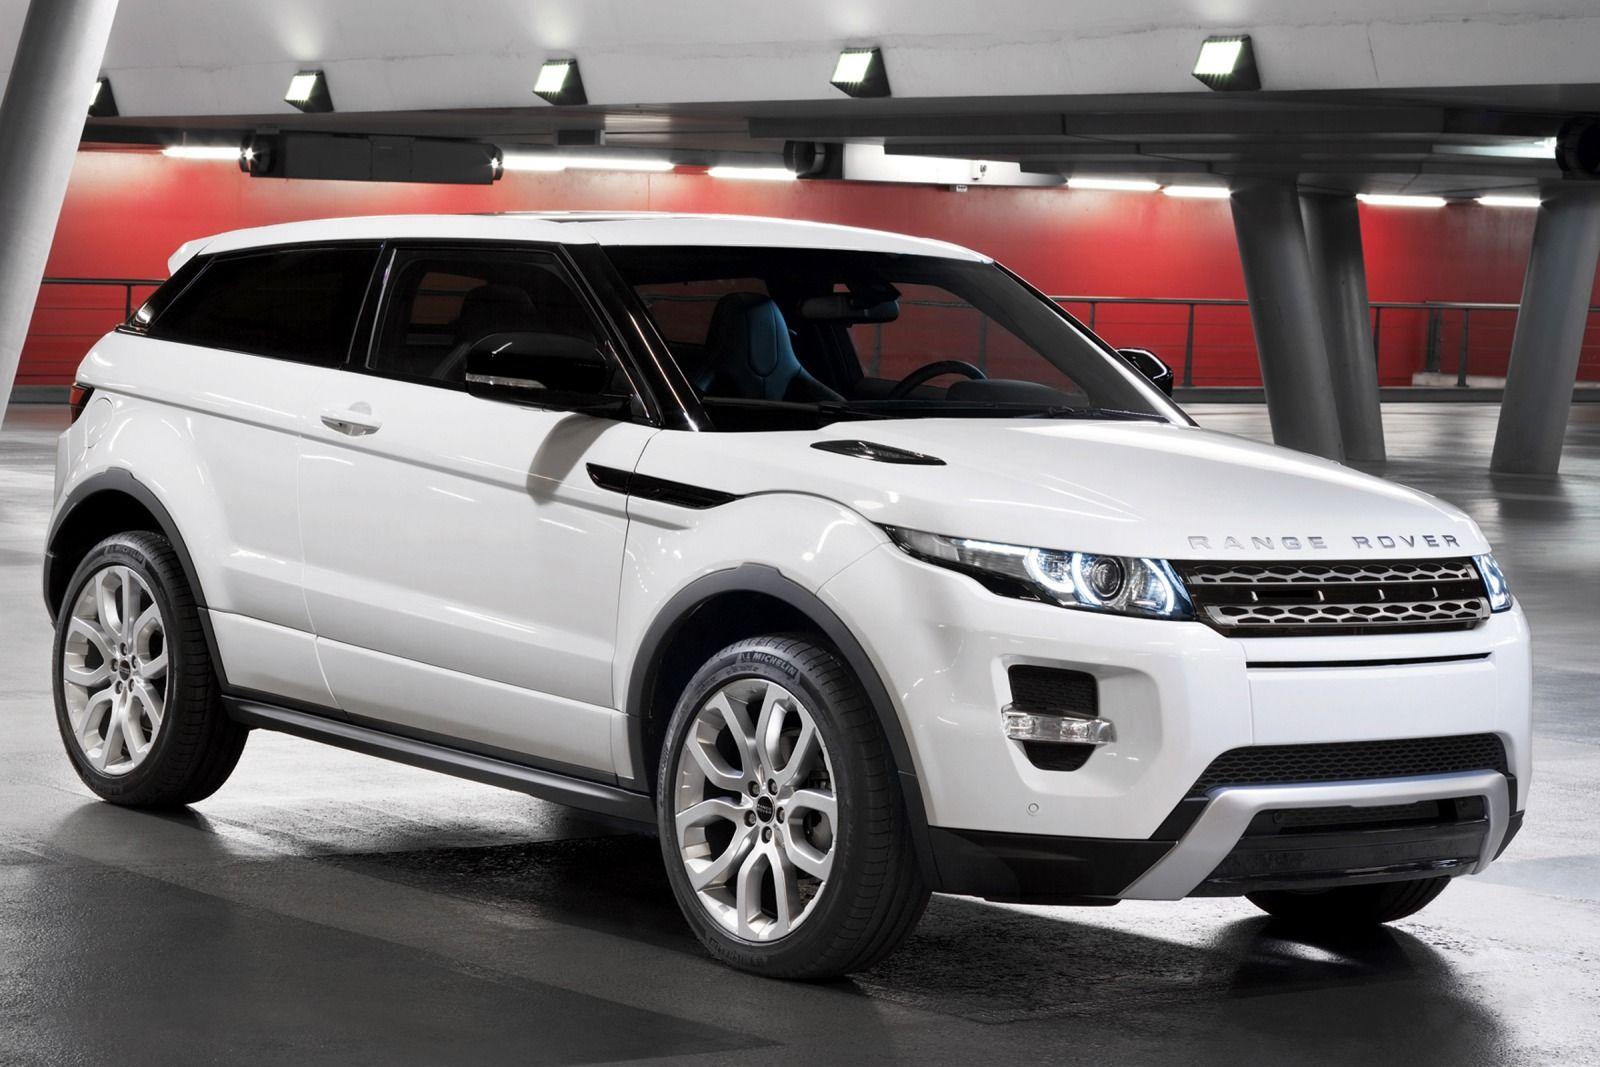 2015 range rover evoque fiyat listesi uygun ta t. Black Bedroom Furniture Sets. Home Design Ideas